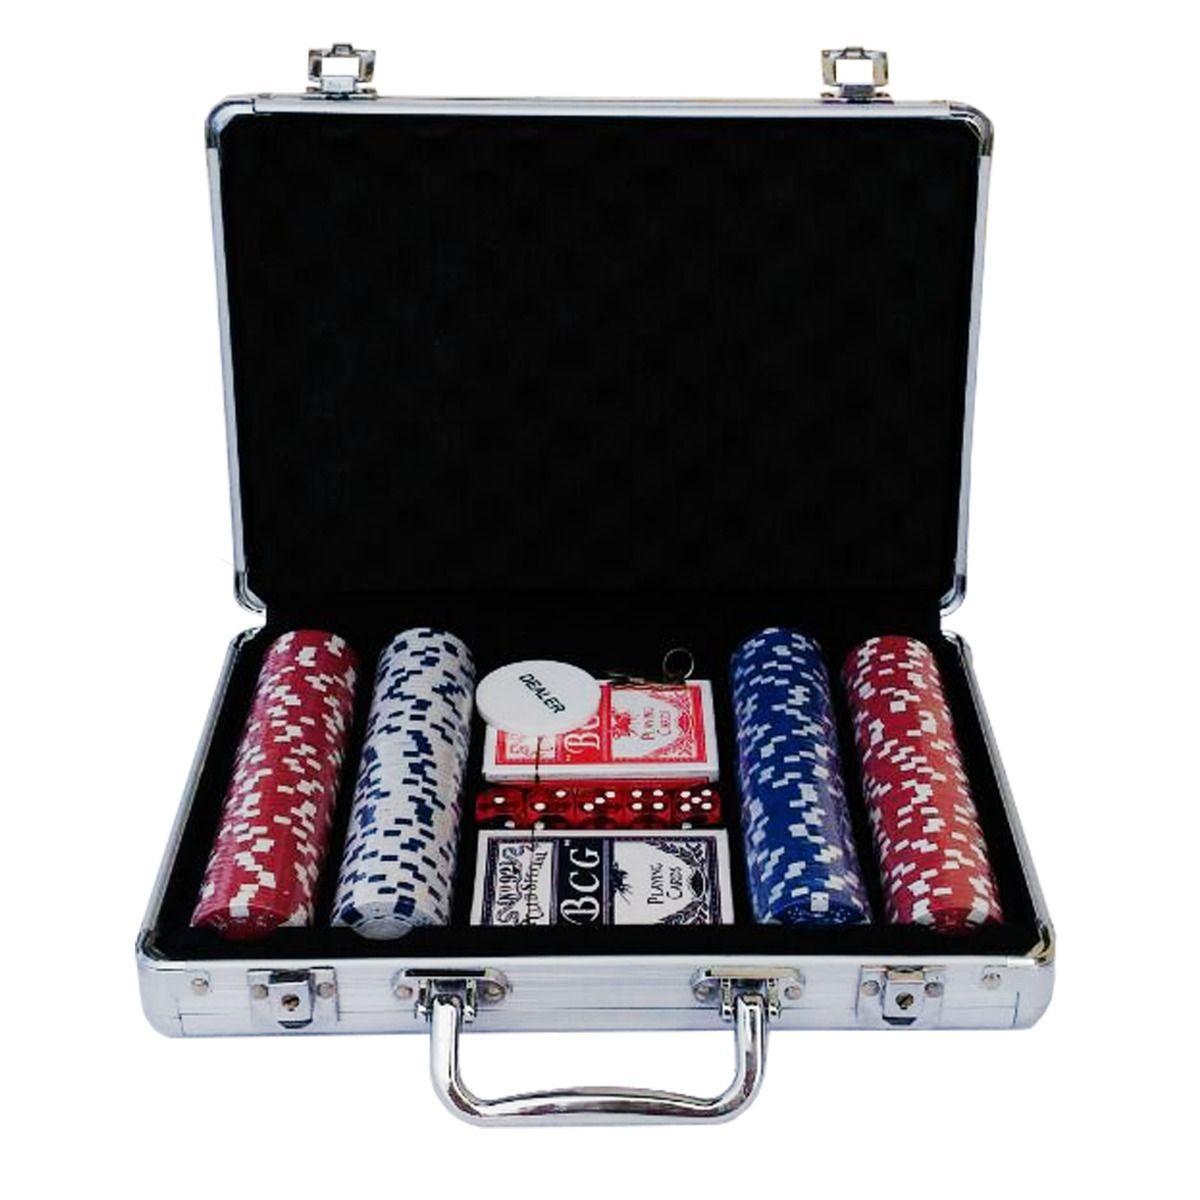 Maleta Poker Profissional 200 Fichas Numerada